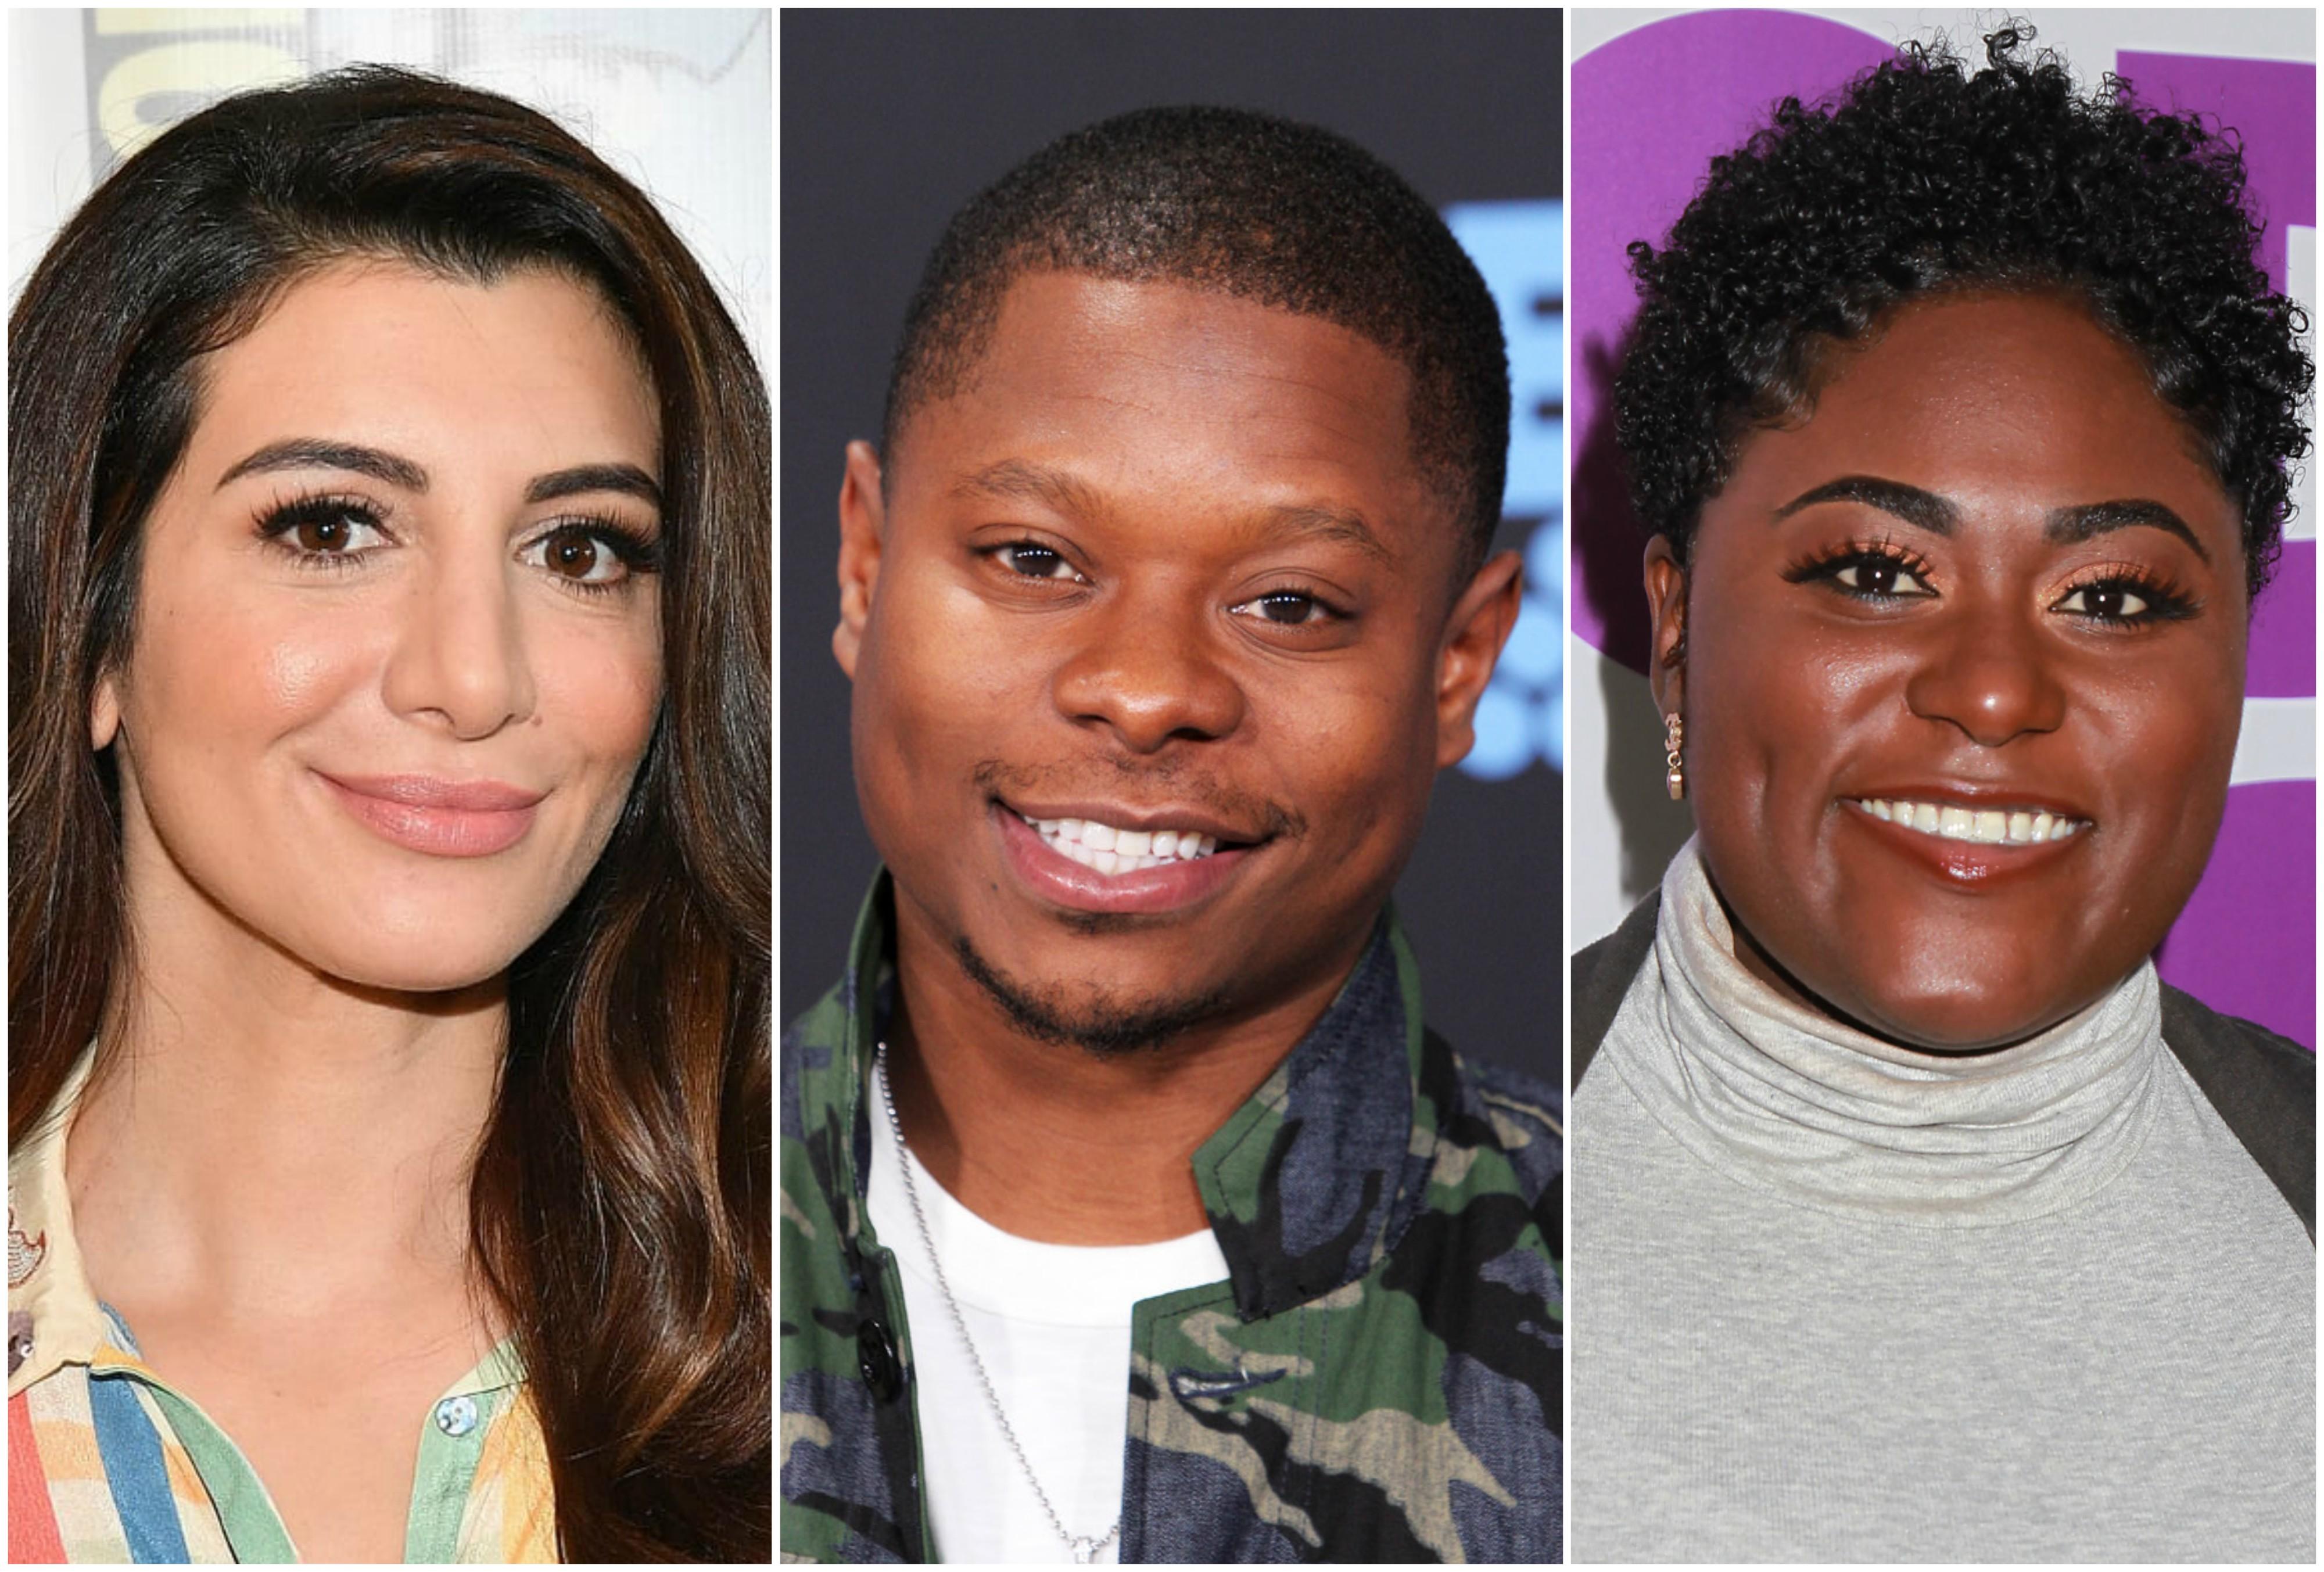 Nasim Pedrad Jason Mitchell Danielle Brooks To Star In Netflix Rom Com Desperados Blackfilm Com Black Movies Television And Theatre News